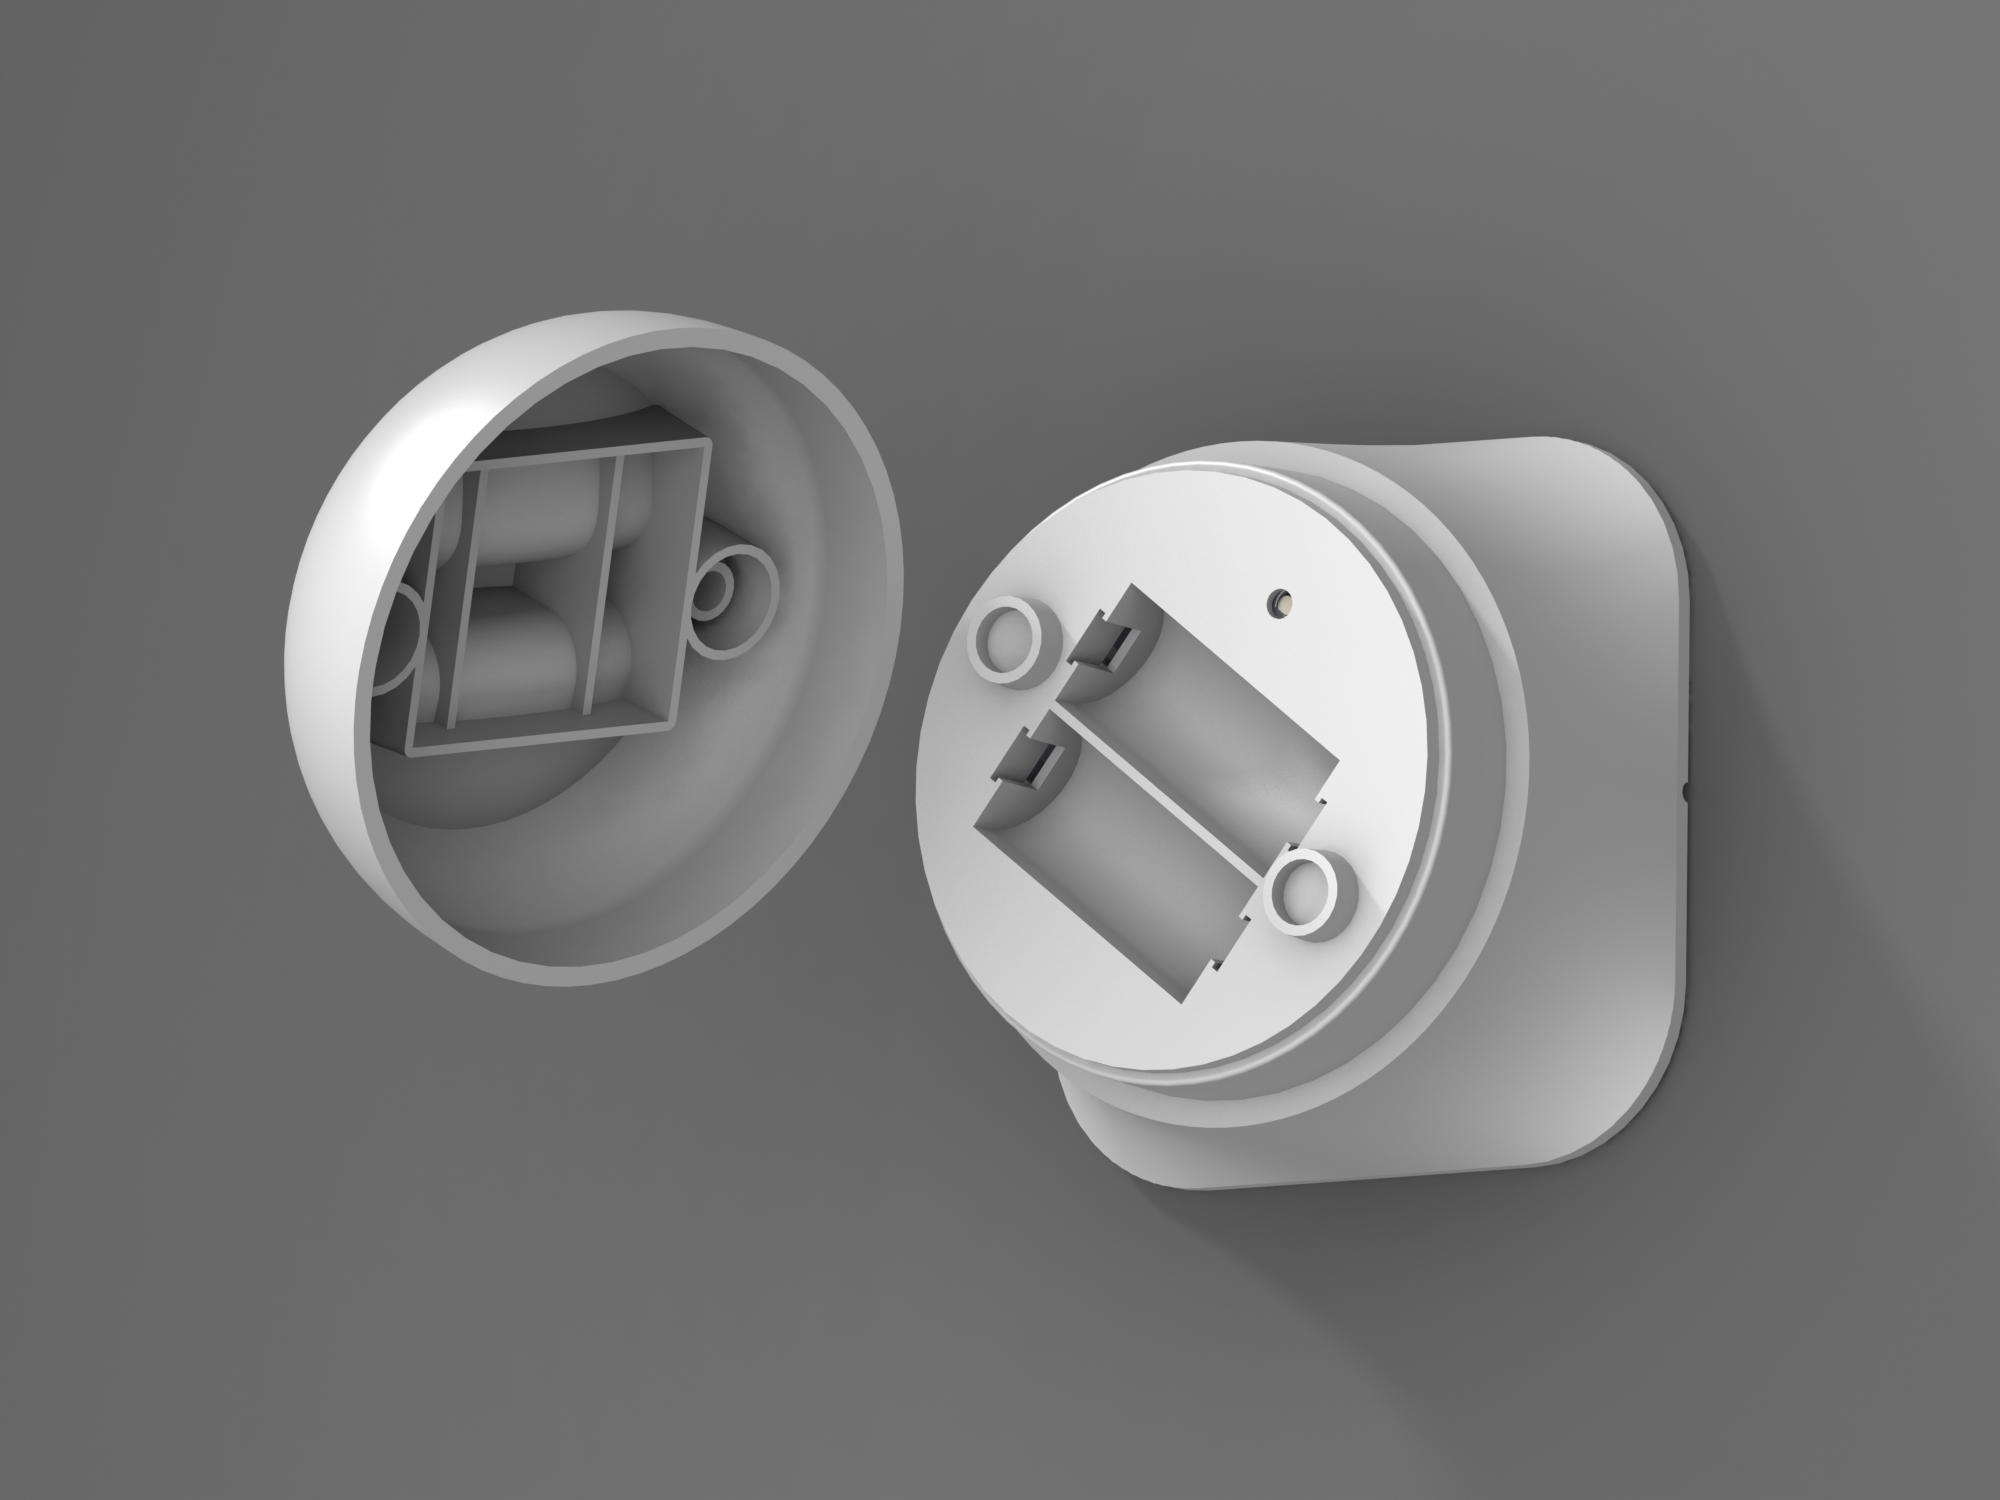 SimSim Smart Lock